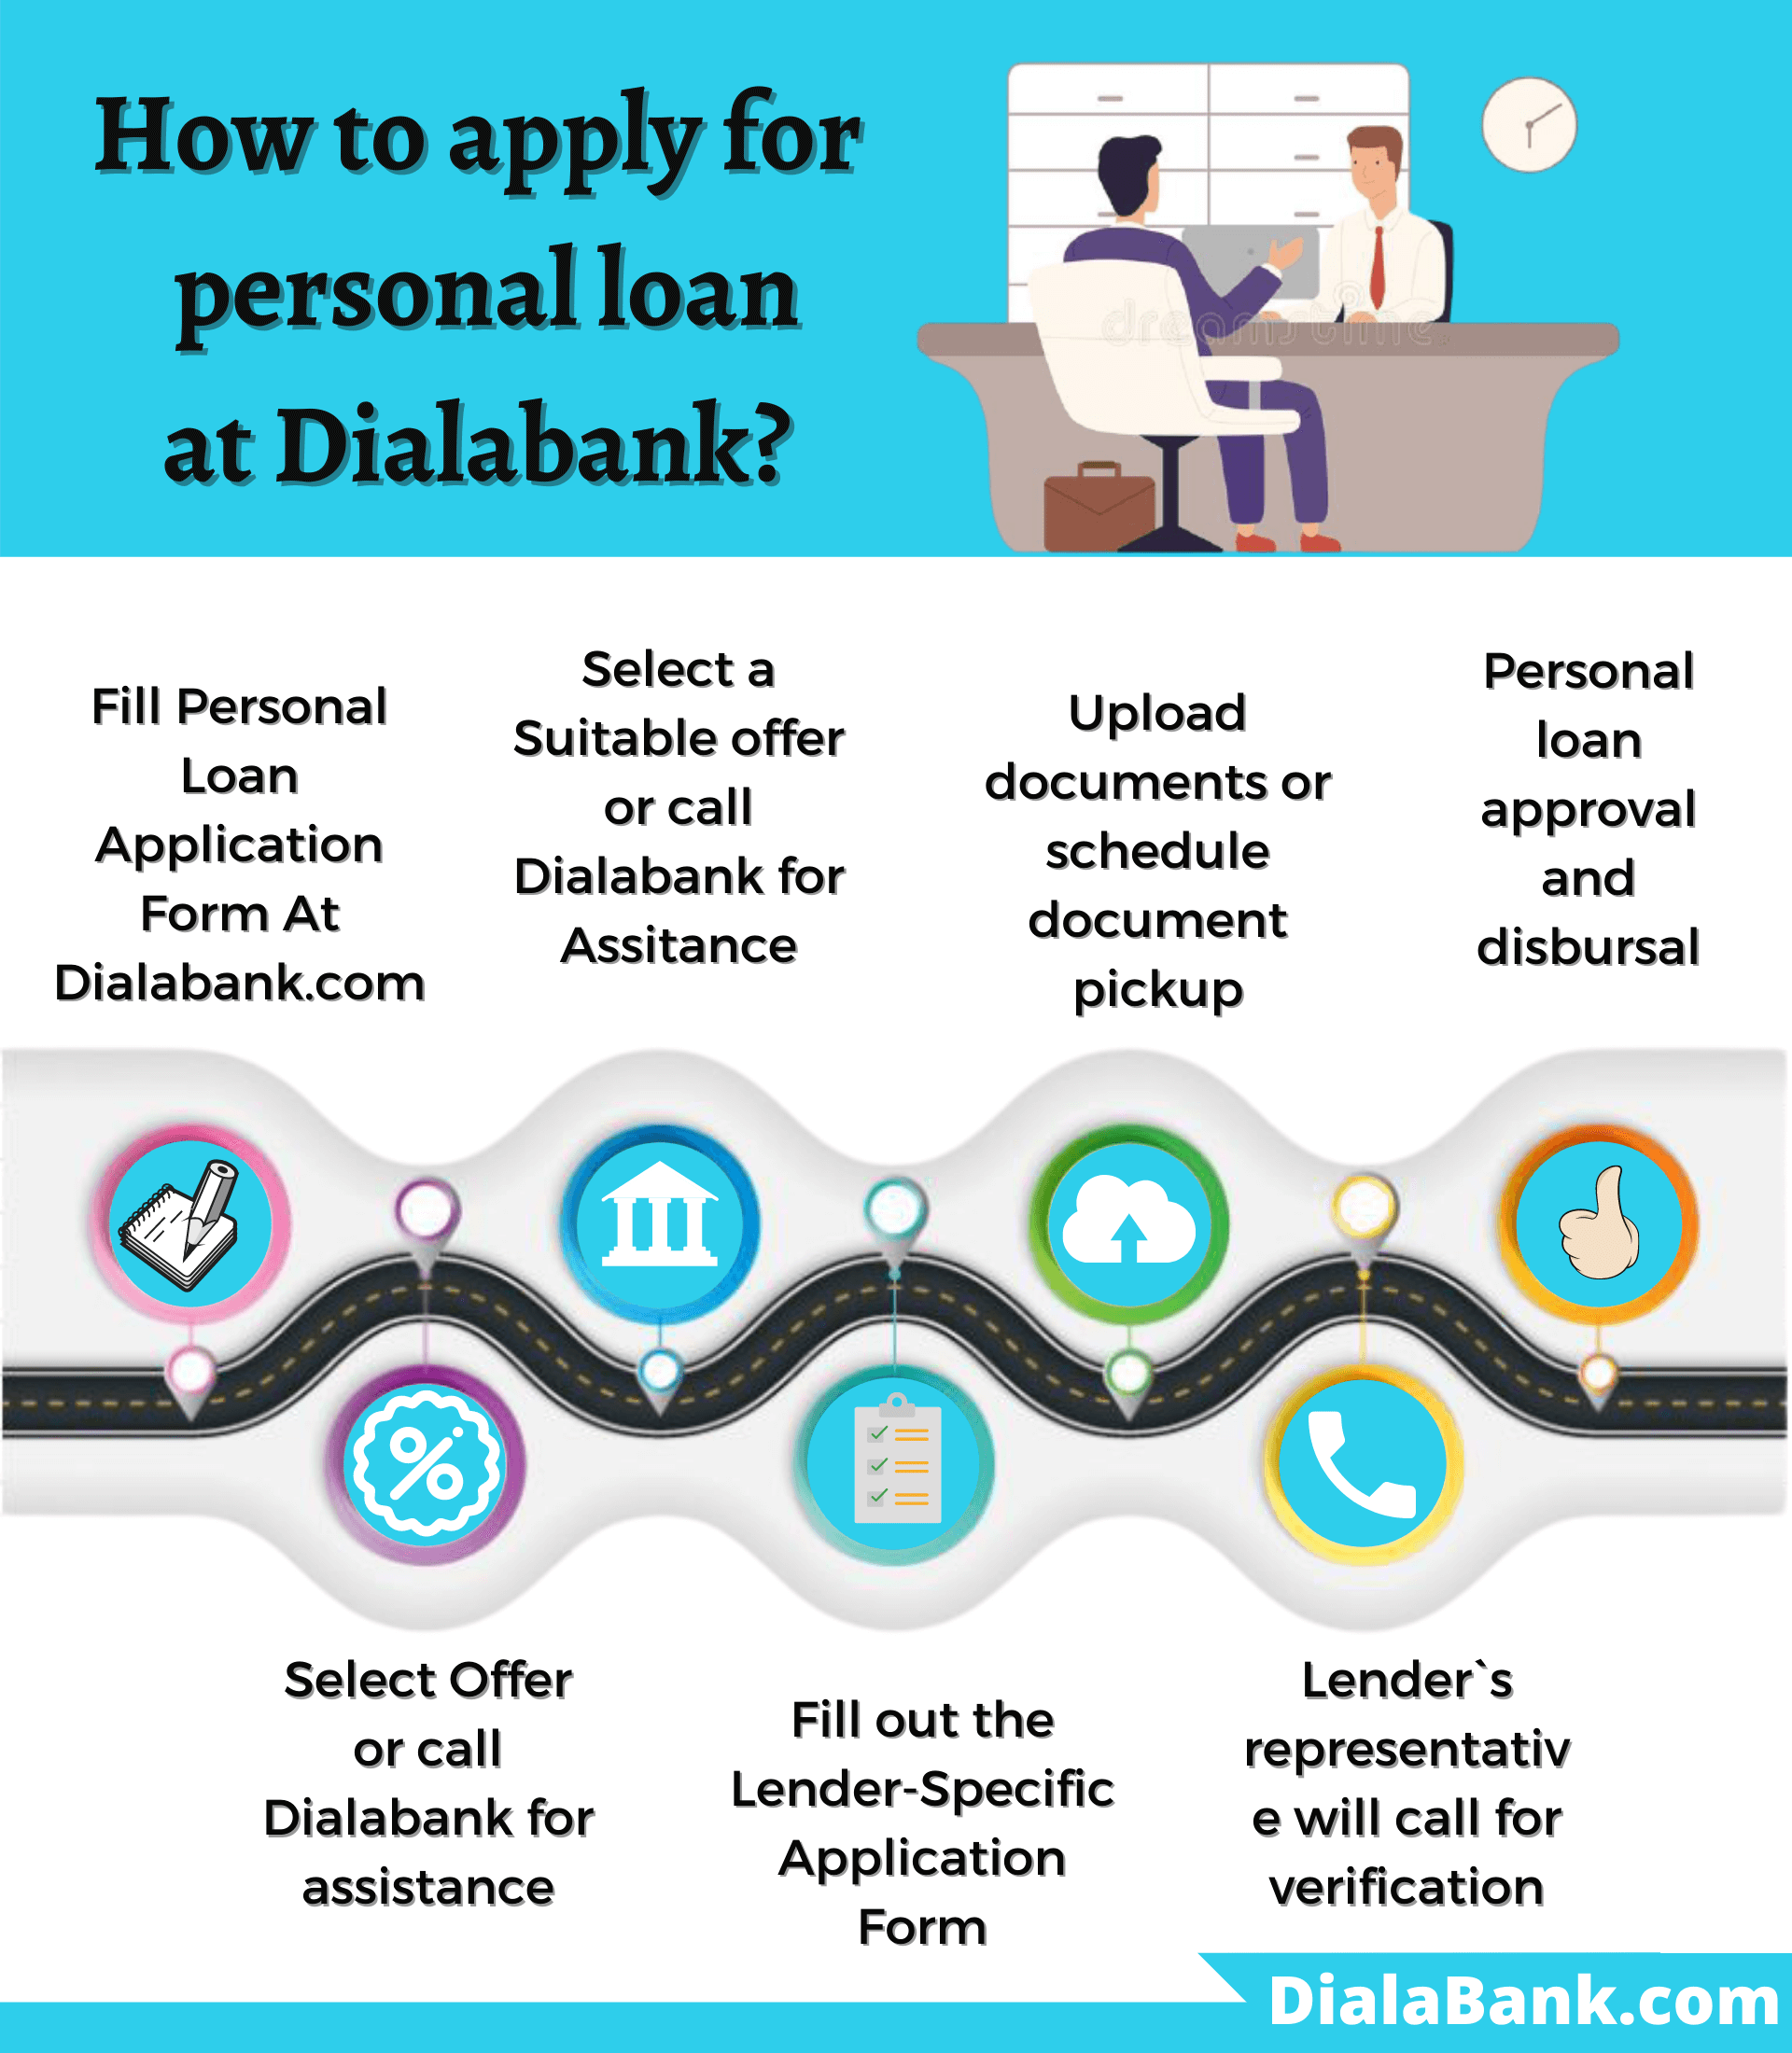 Deutsche Bank Personal Loan